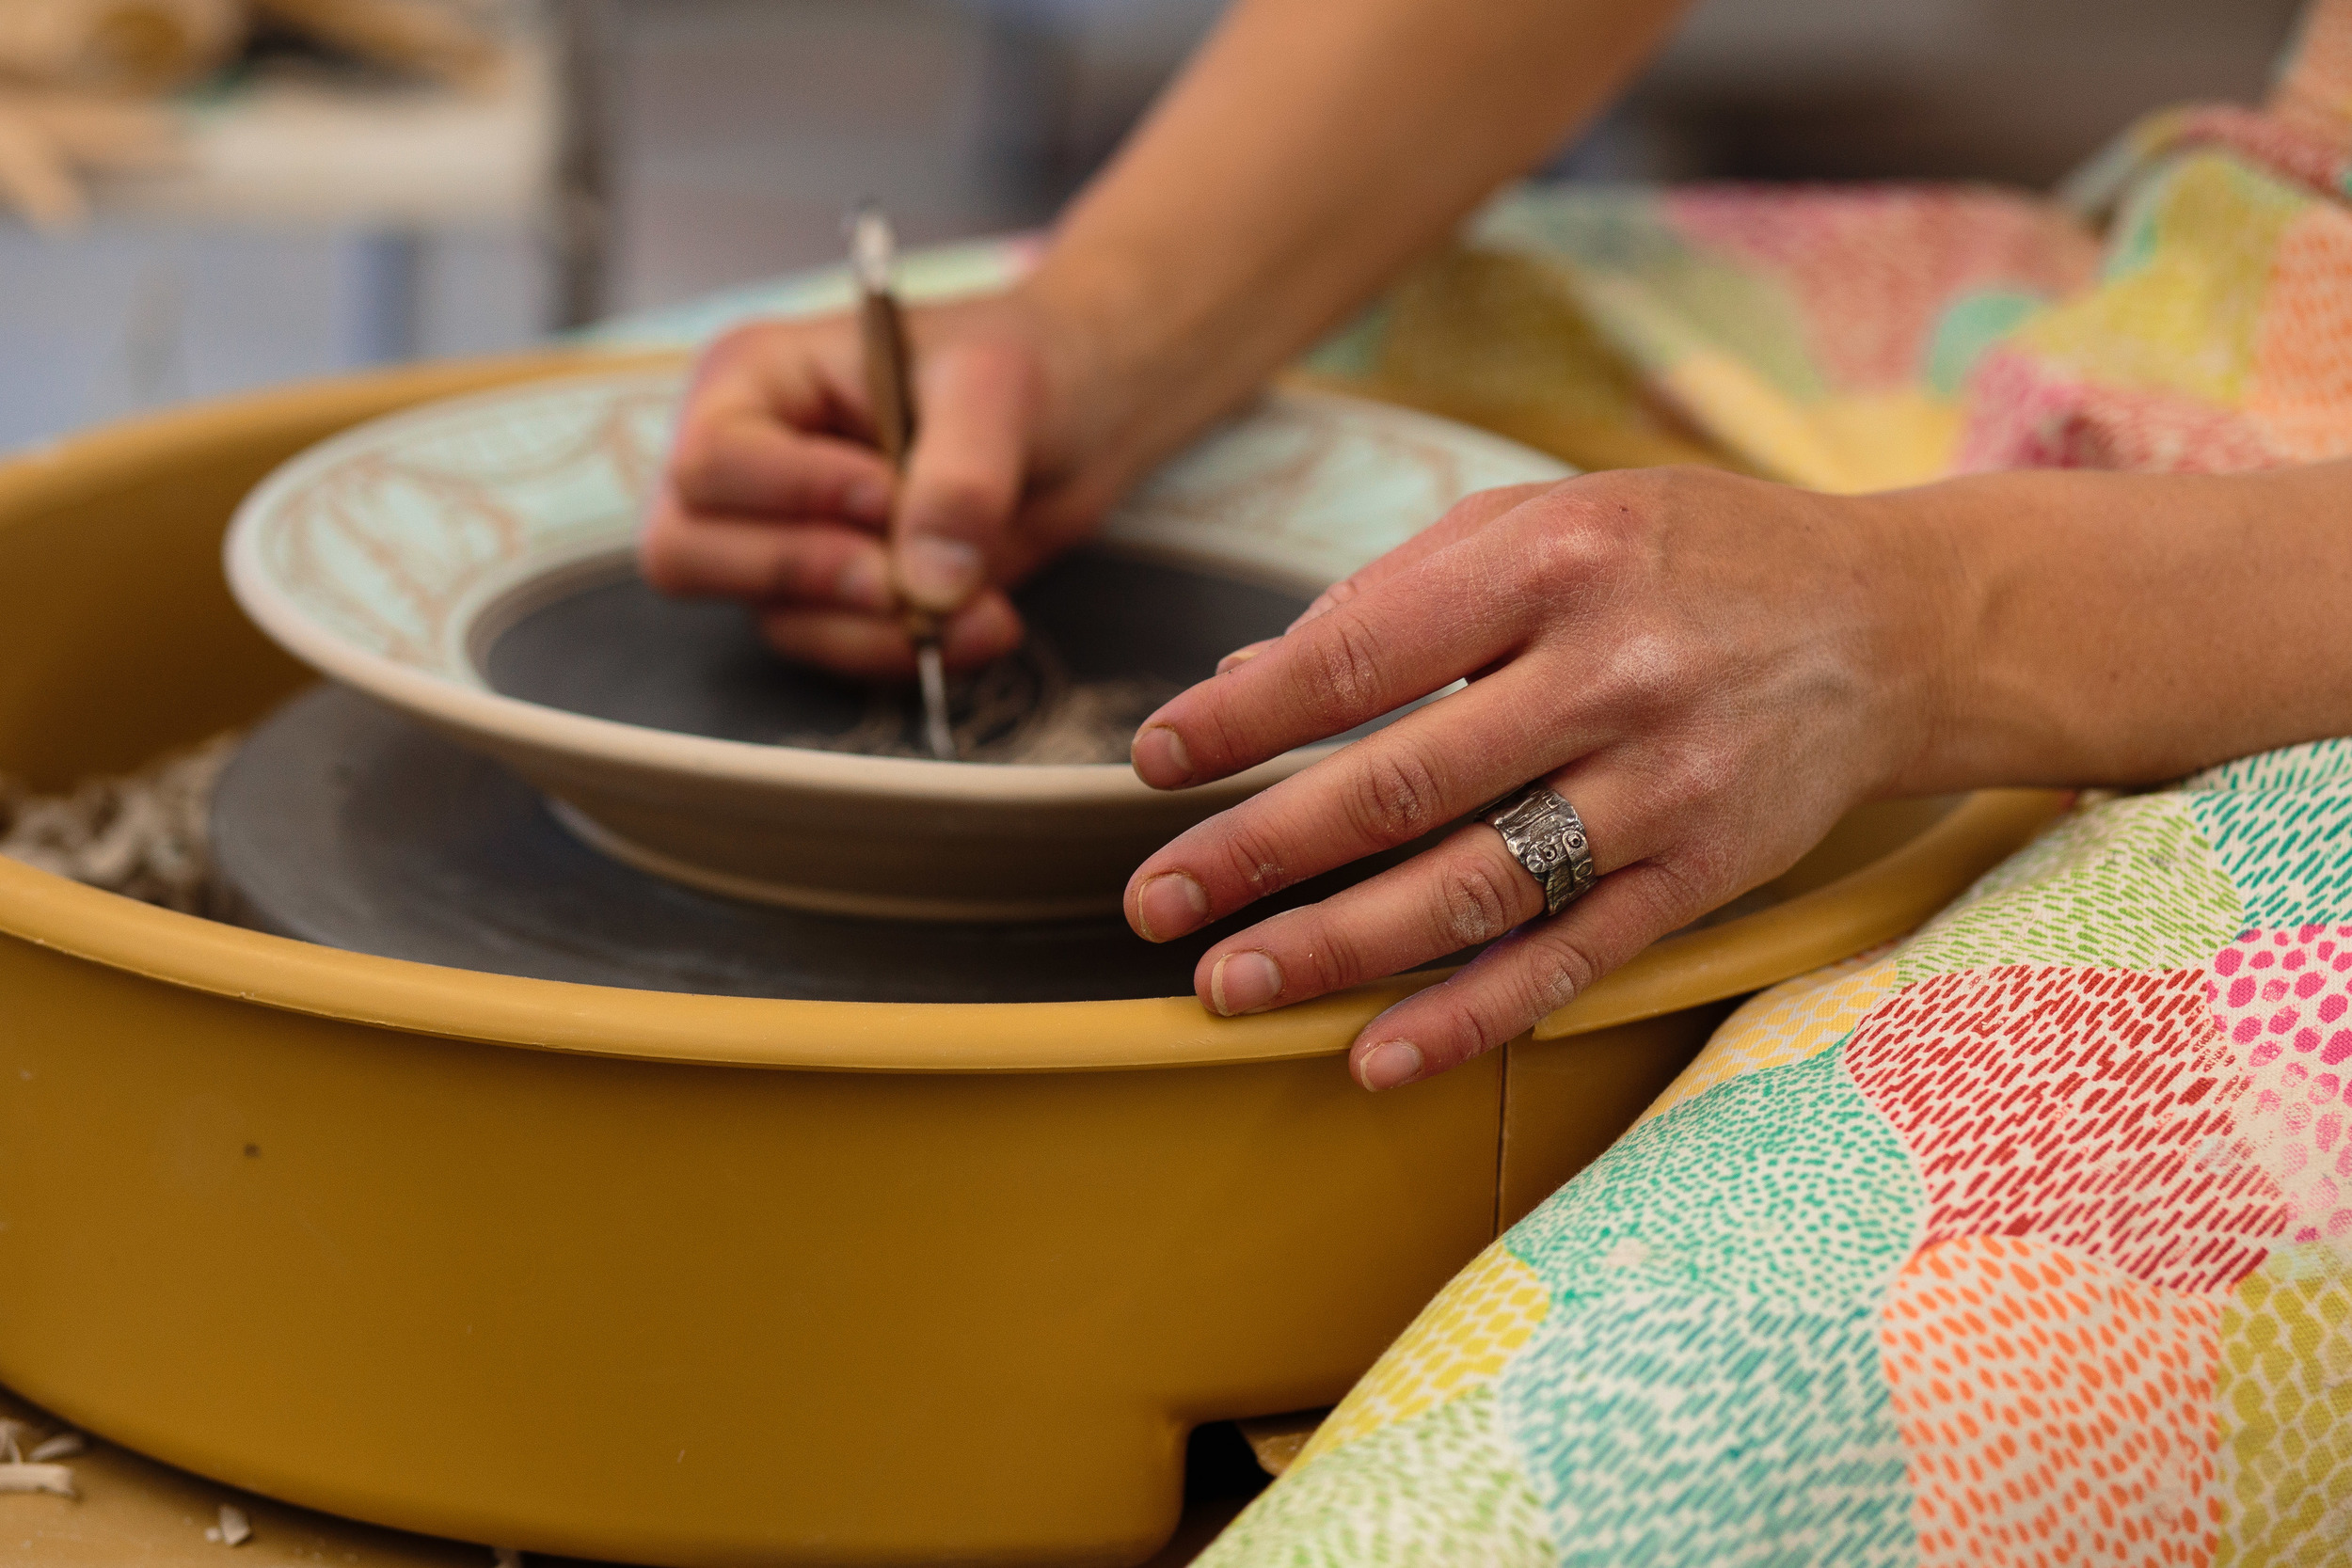 Potter's hand detail carving bowl image